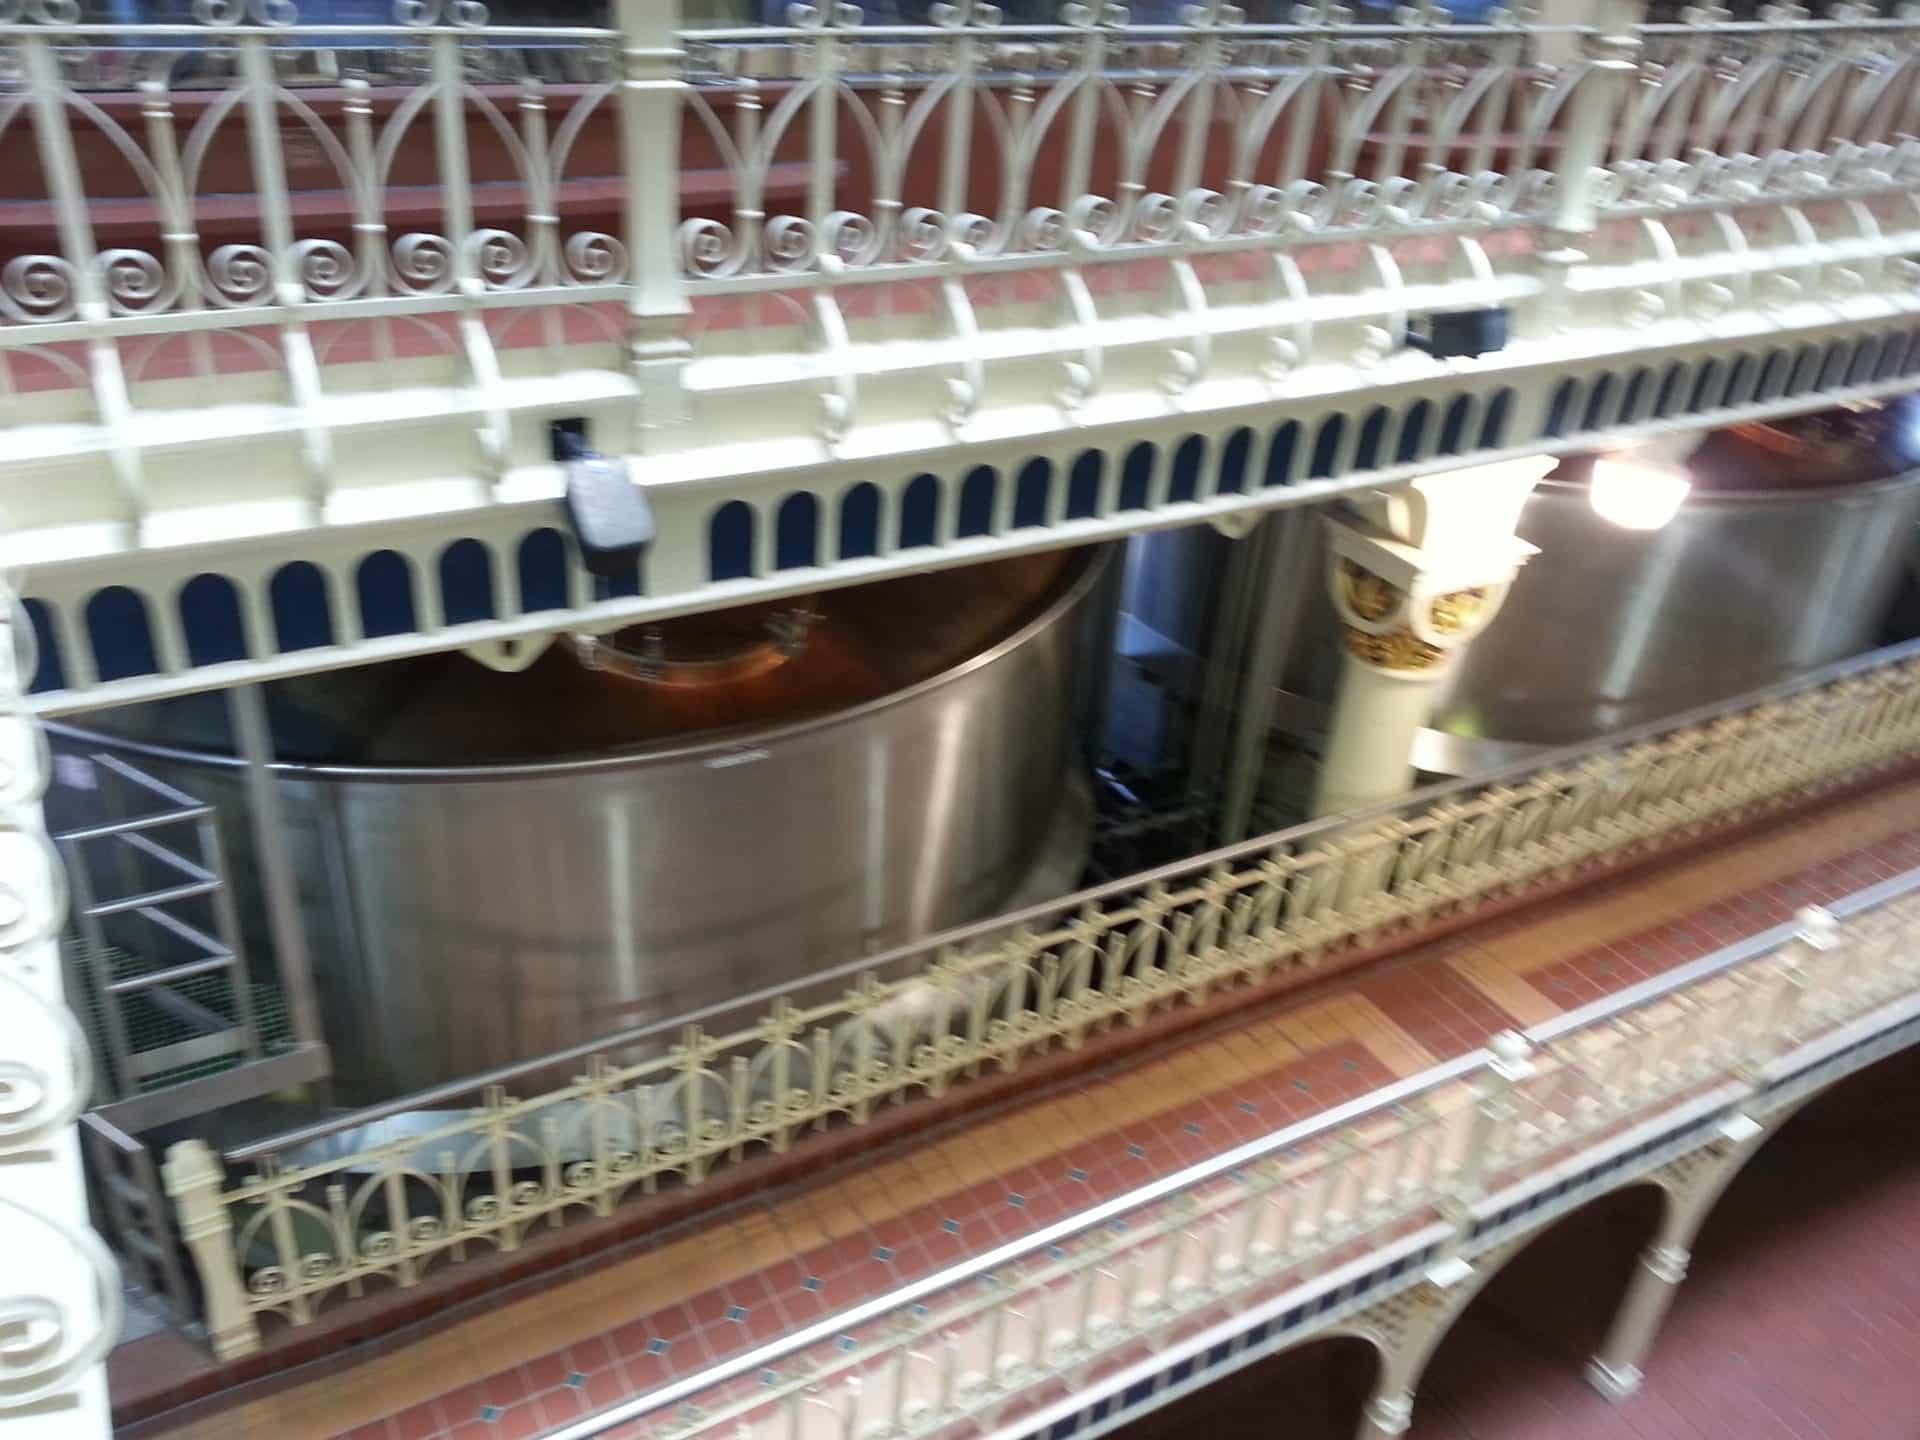 Budweiser Brewery Tour, St. Louis, MO - Making Beer